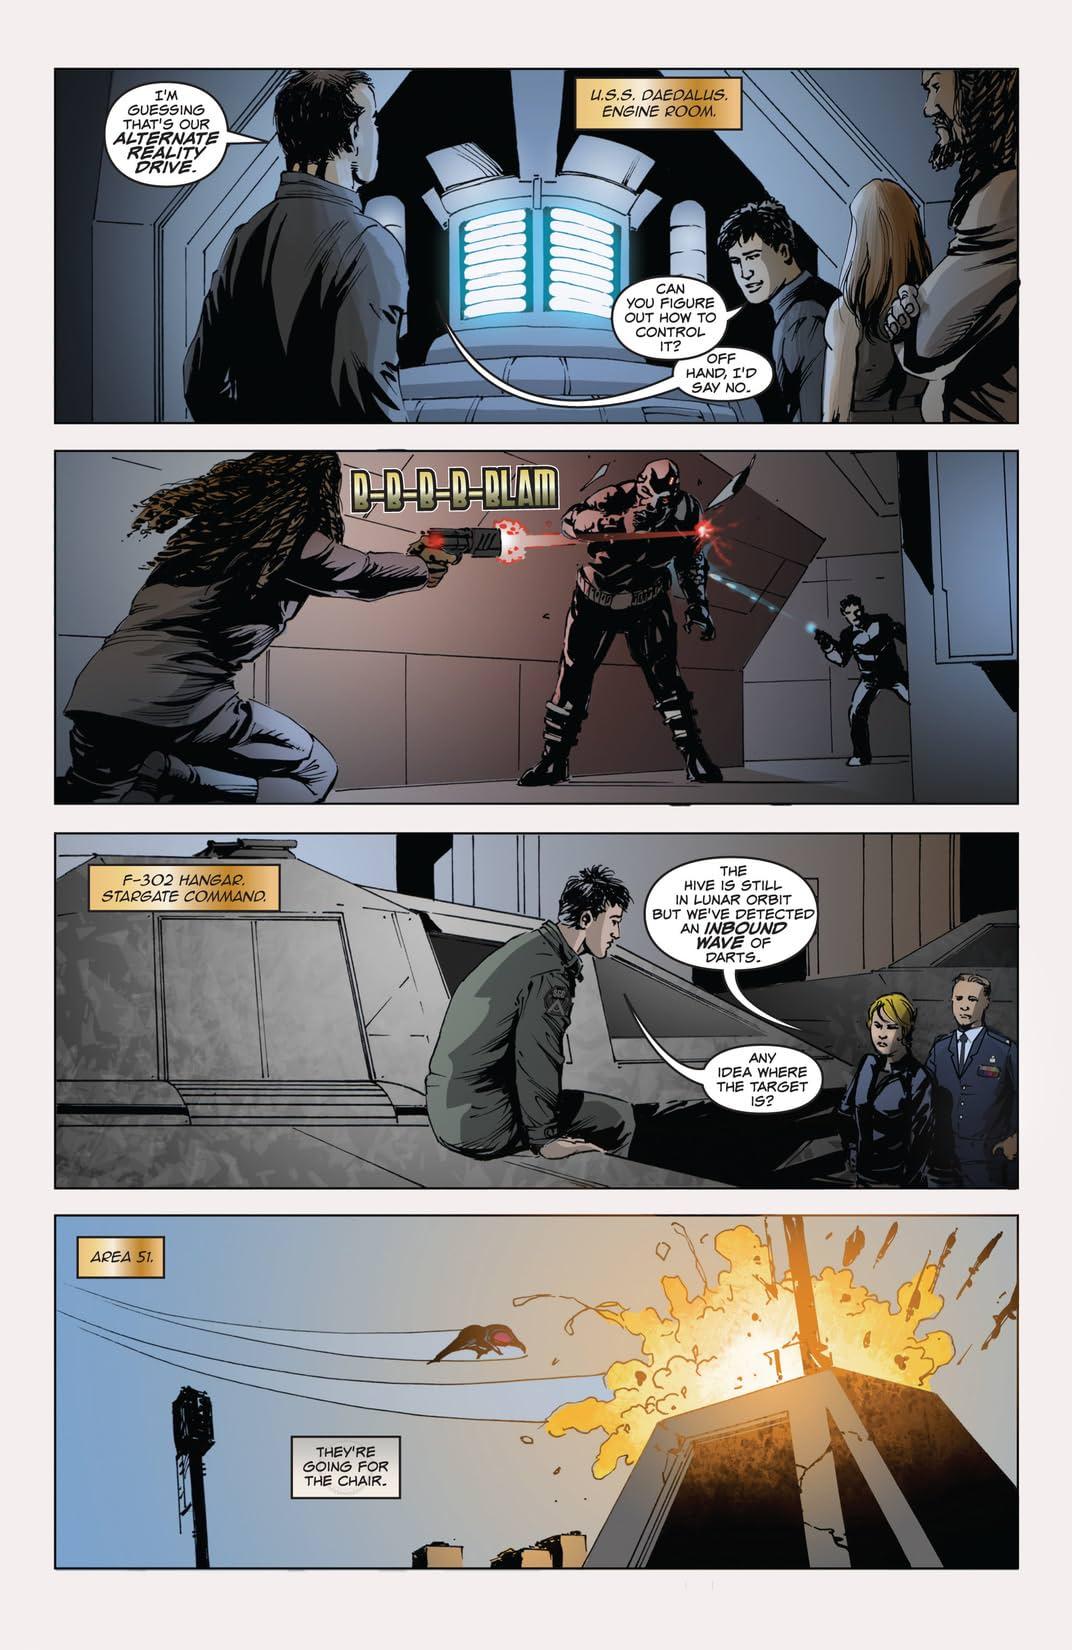 Stargate Atlantis Back to Pegasus #1